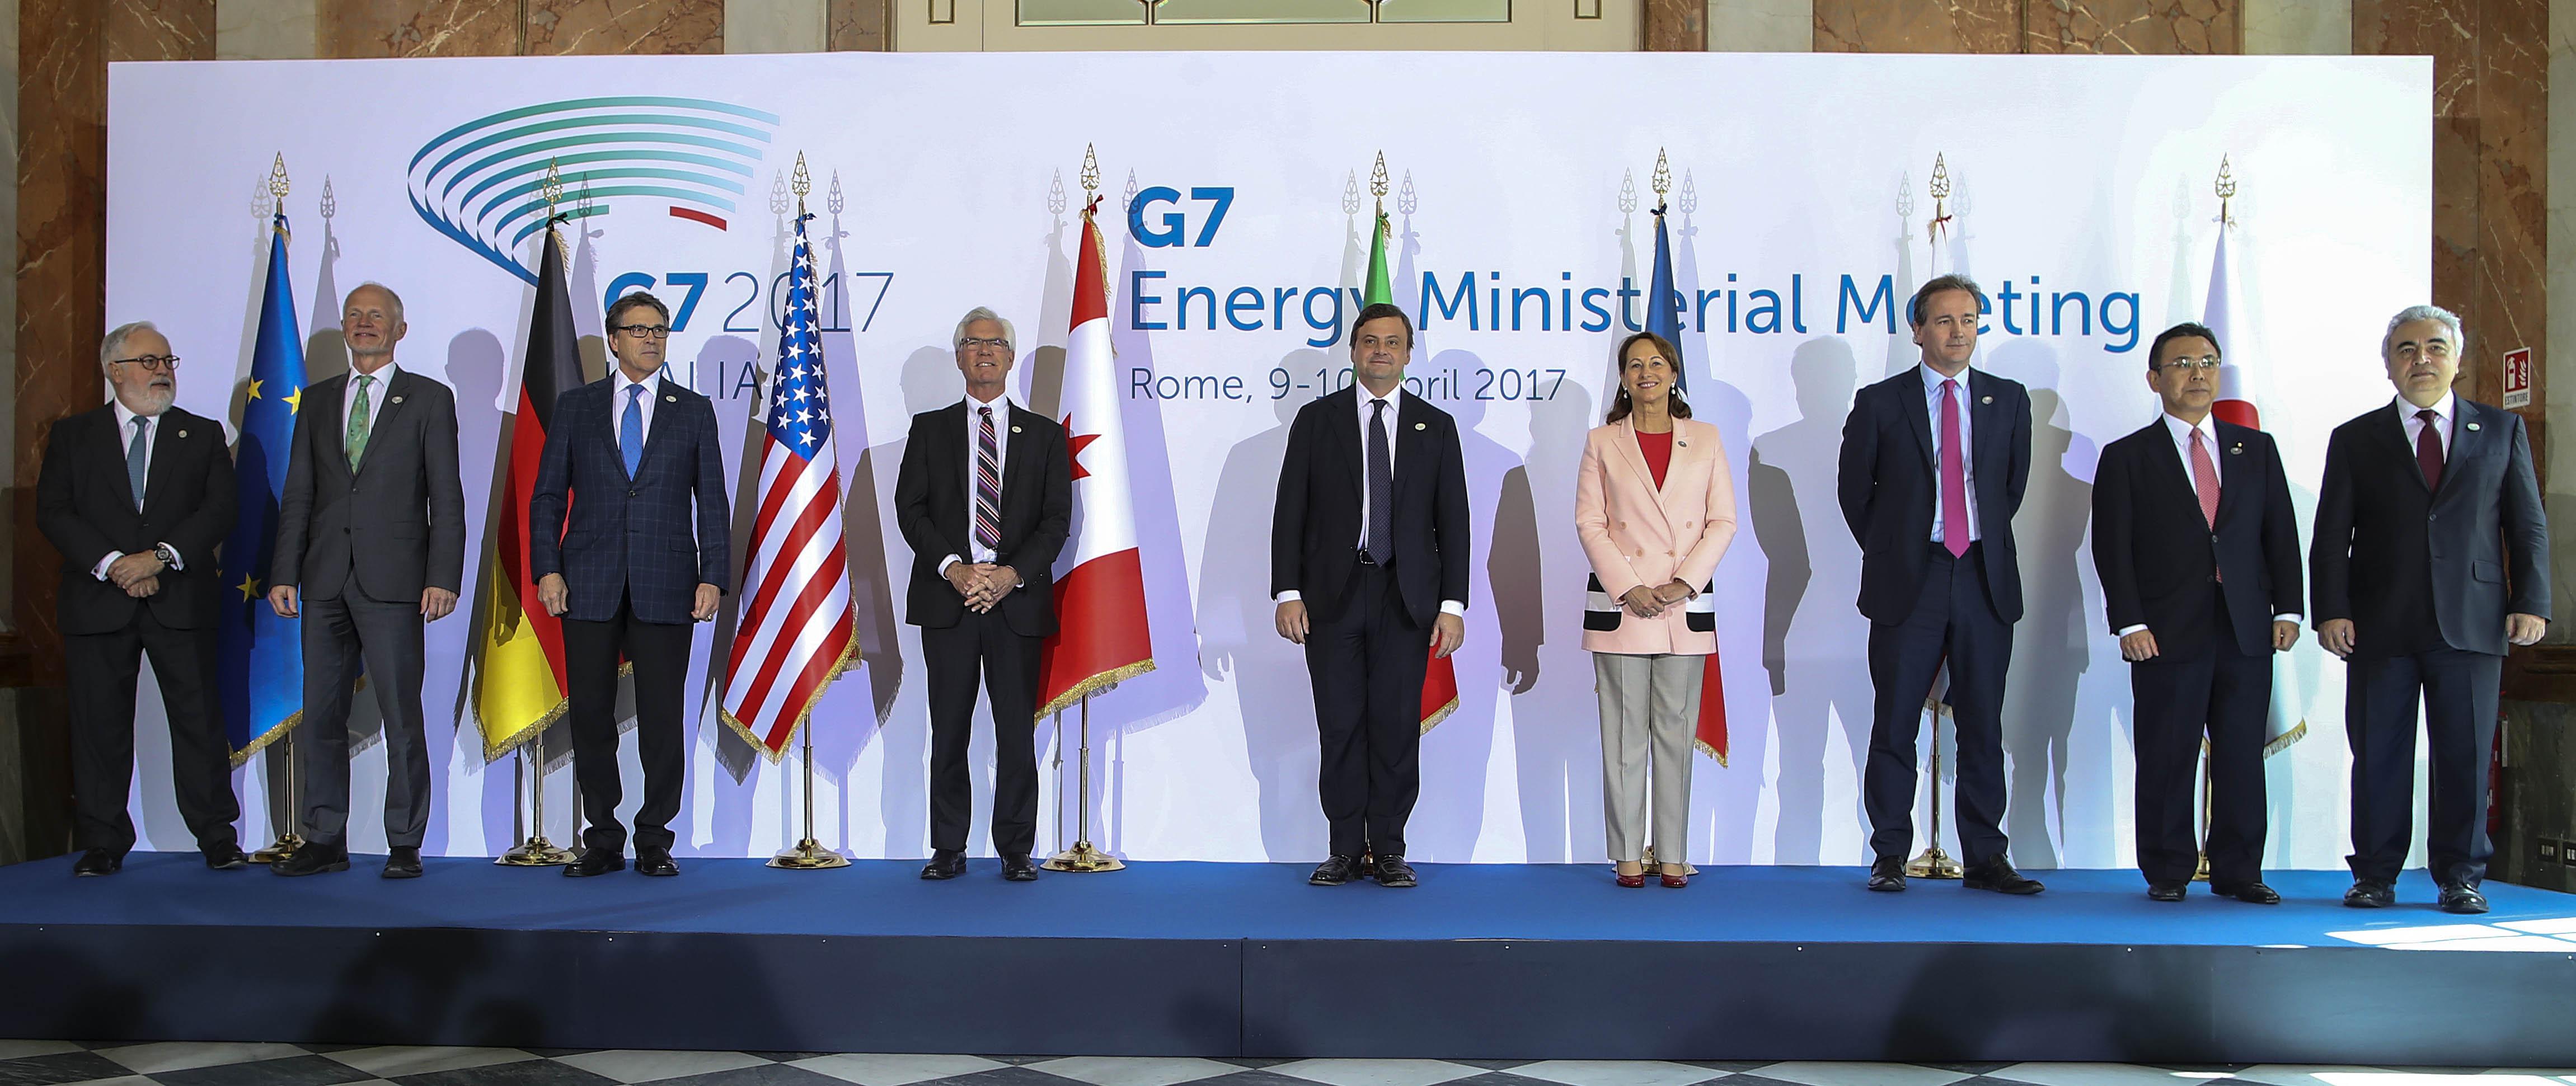 Carlo Calenda G7 Energia gruppo